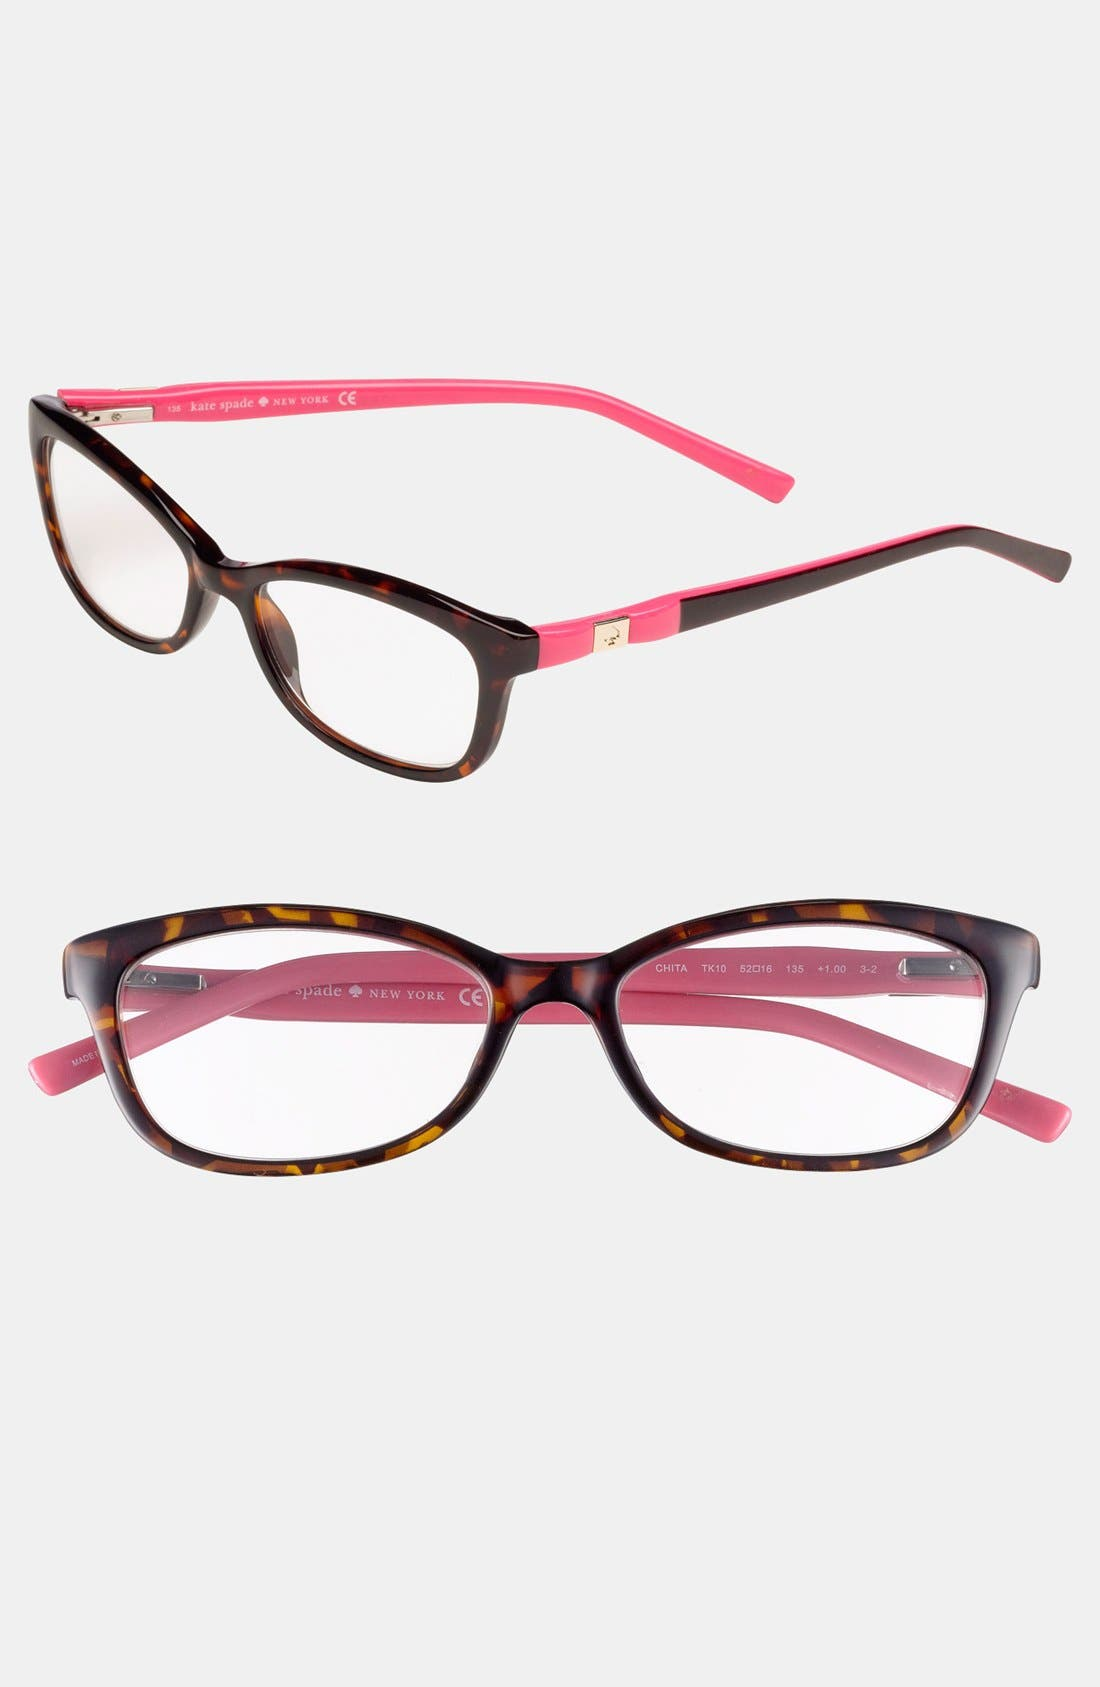 Main Image - kate spade new york 'chita' 52mm reading glasses